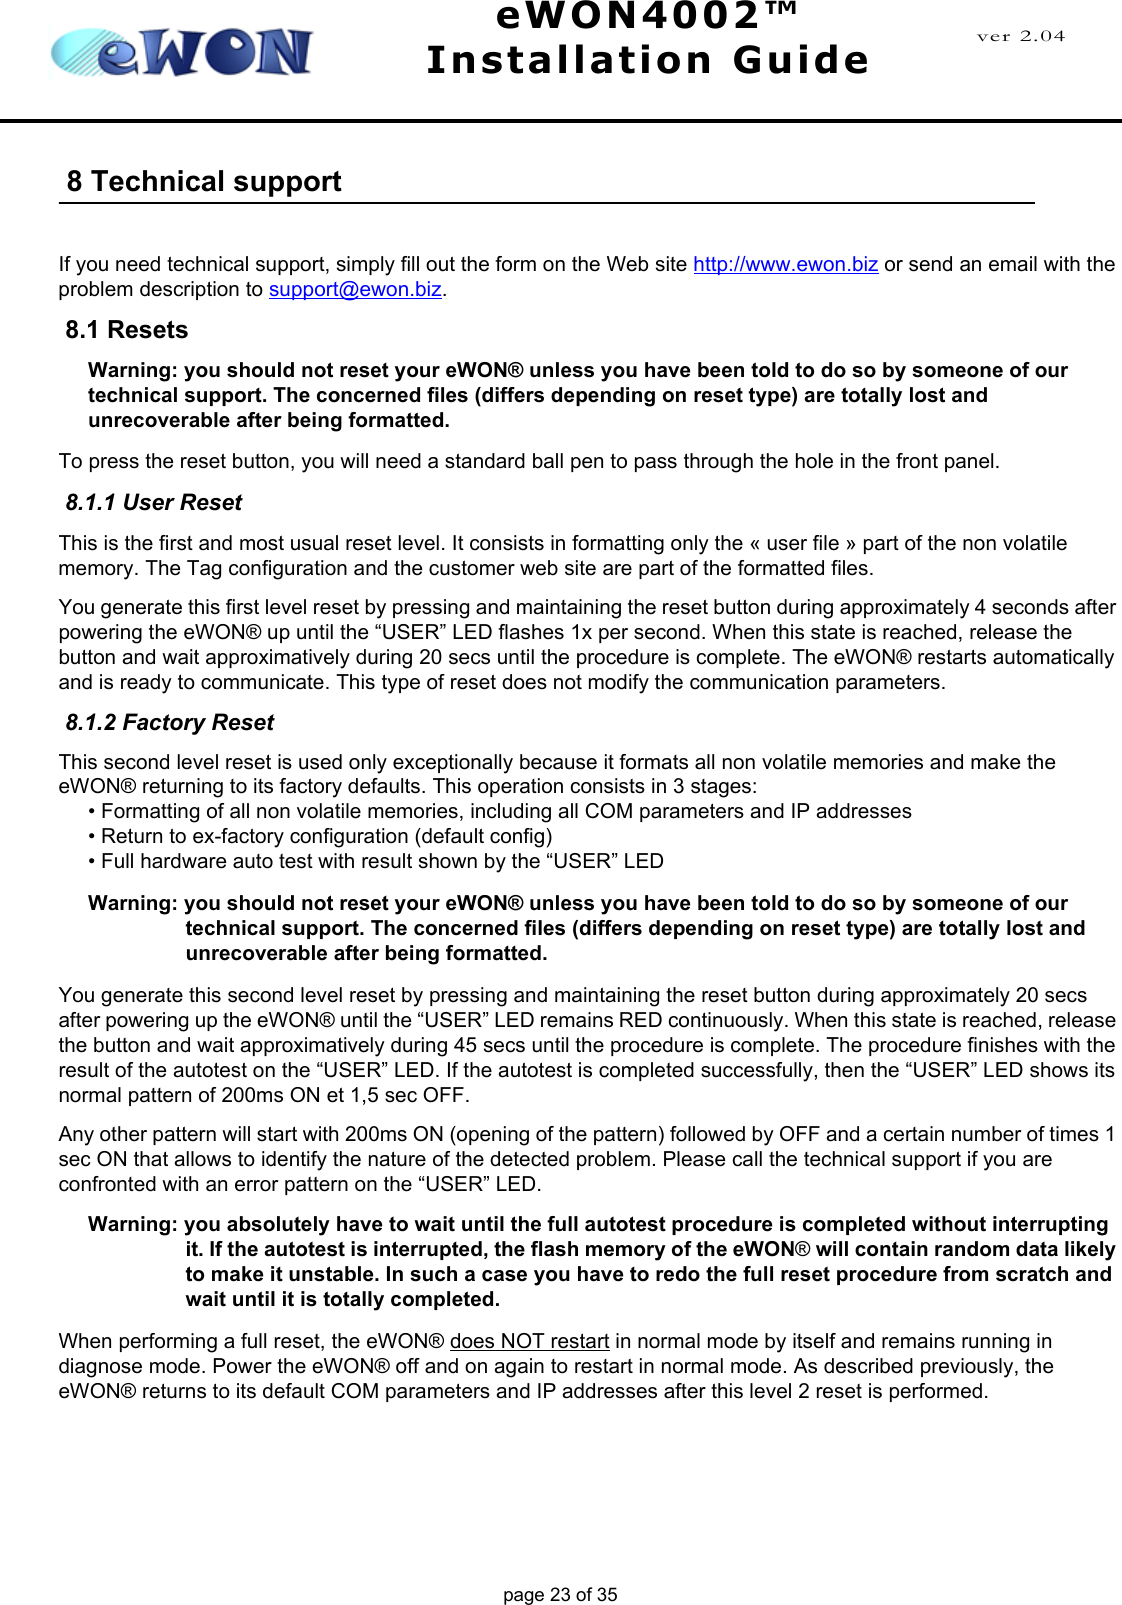 Siemens Ewon4002 Users Manual EWON4002™ IG_UK